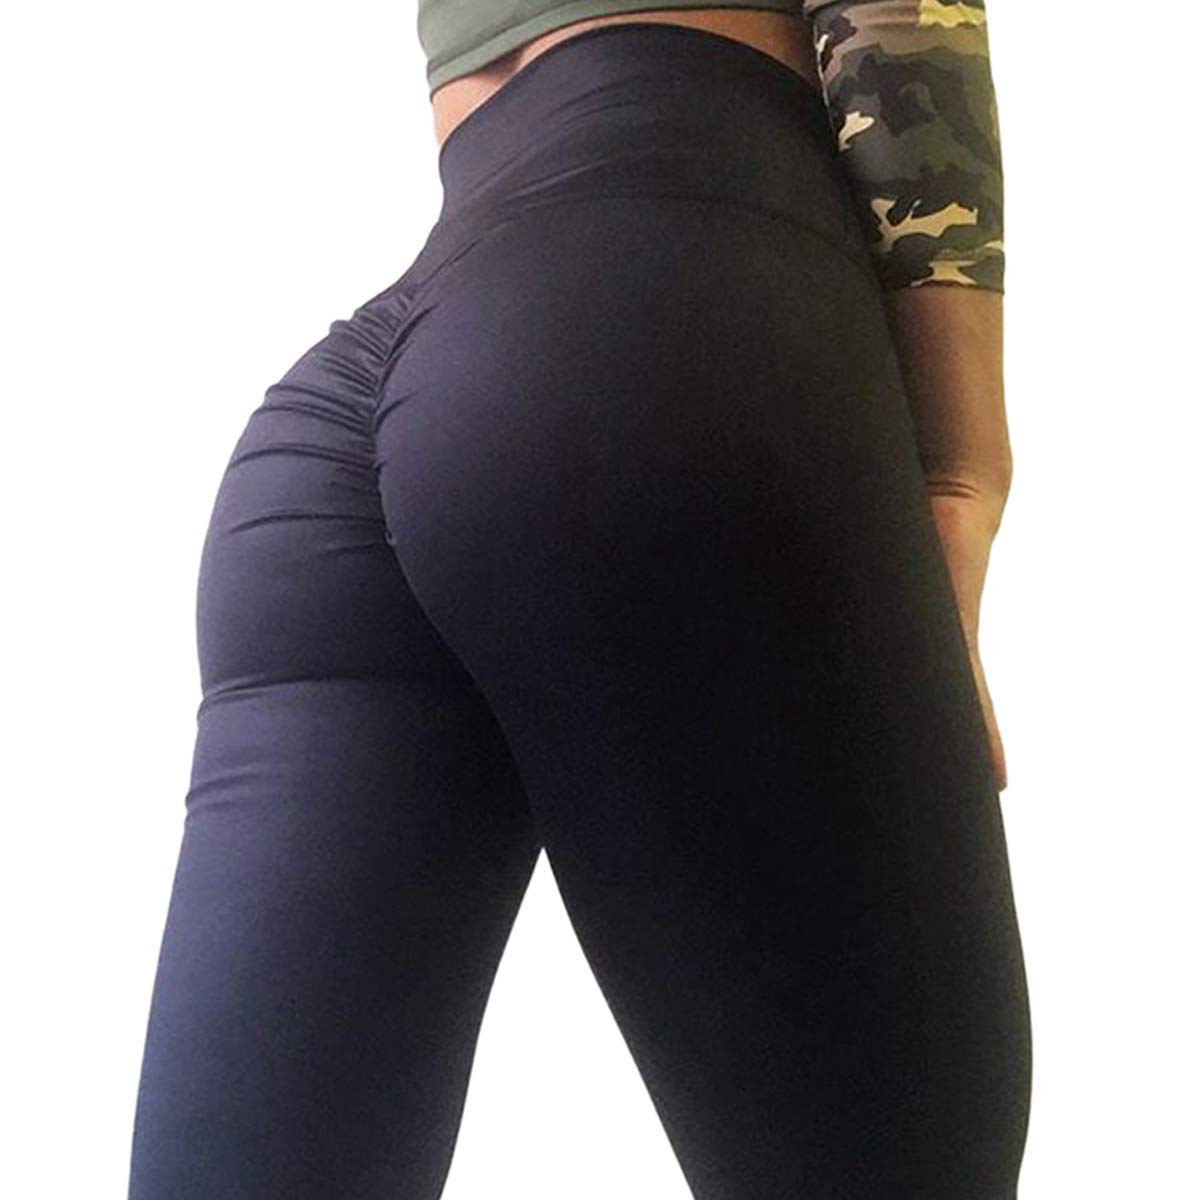 CROSS1946 Women's High Waist Back Ruched Legging Butt Lift Yoga Pants Hip Push up Workout Stretch Capris S